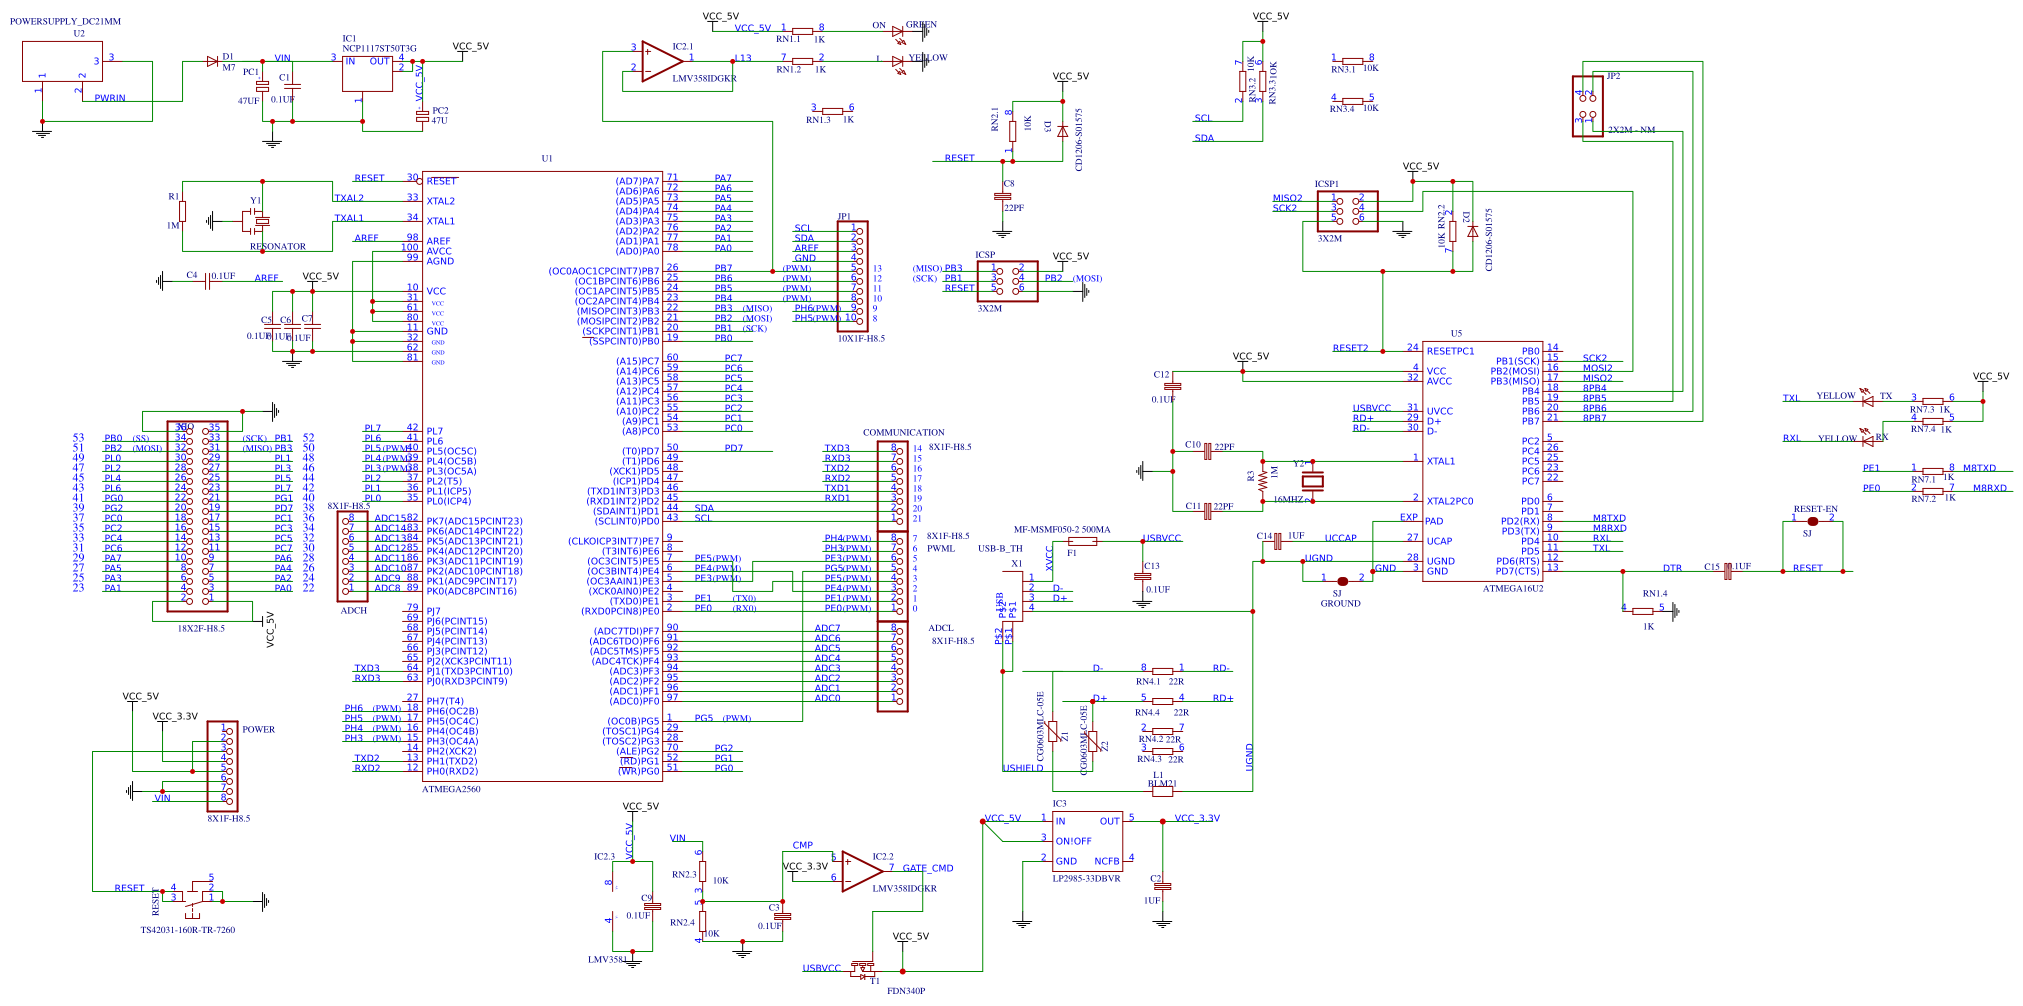 arduino mega 2560 schematic - Search - EasA on arduino nano schematic, arduino mega 2560 map, arduino mega 2560 board, arduino speaker schematic, arduino mega 2560 led, arduino mega layout, arduino uno schematic, arduino mega adk, arduino mega 2560 programming, arduino schematic symbol, arduino mega 2560 pin mapping, arduino mega case, arduino mega size, arduino pro schematic, arduino mega specs, arduino microcontroller schematic, arduino mega 2560 datasheet, breadboard arduino schematic, arduino r3 schematic, arduino ethernet schematic,